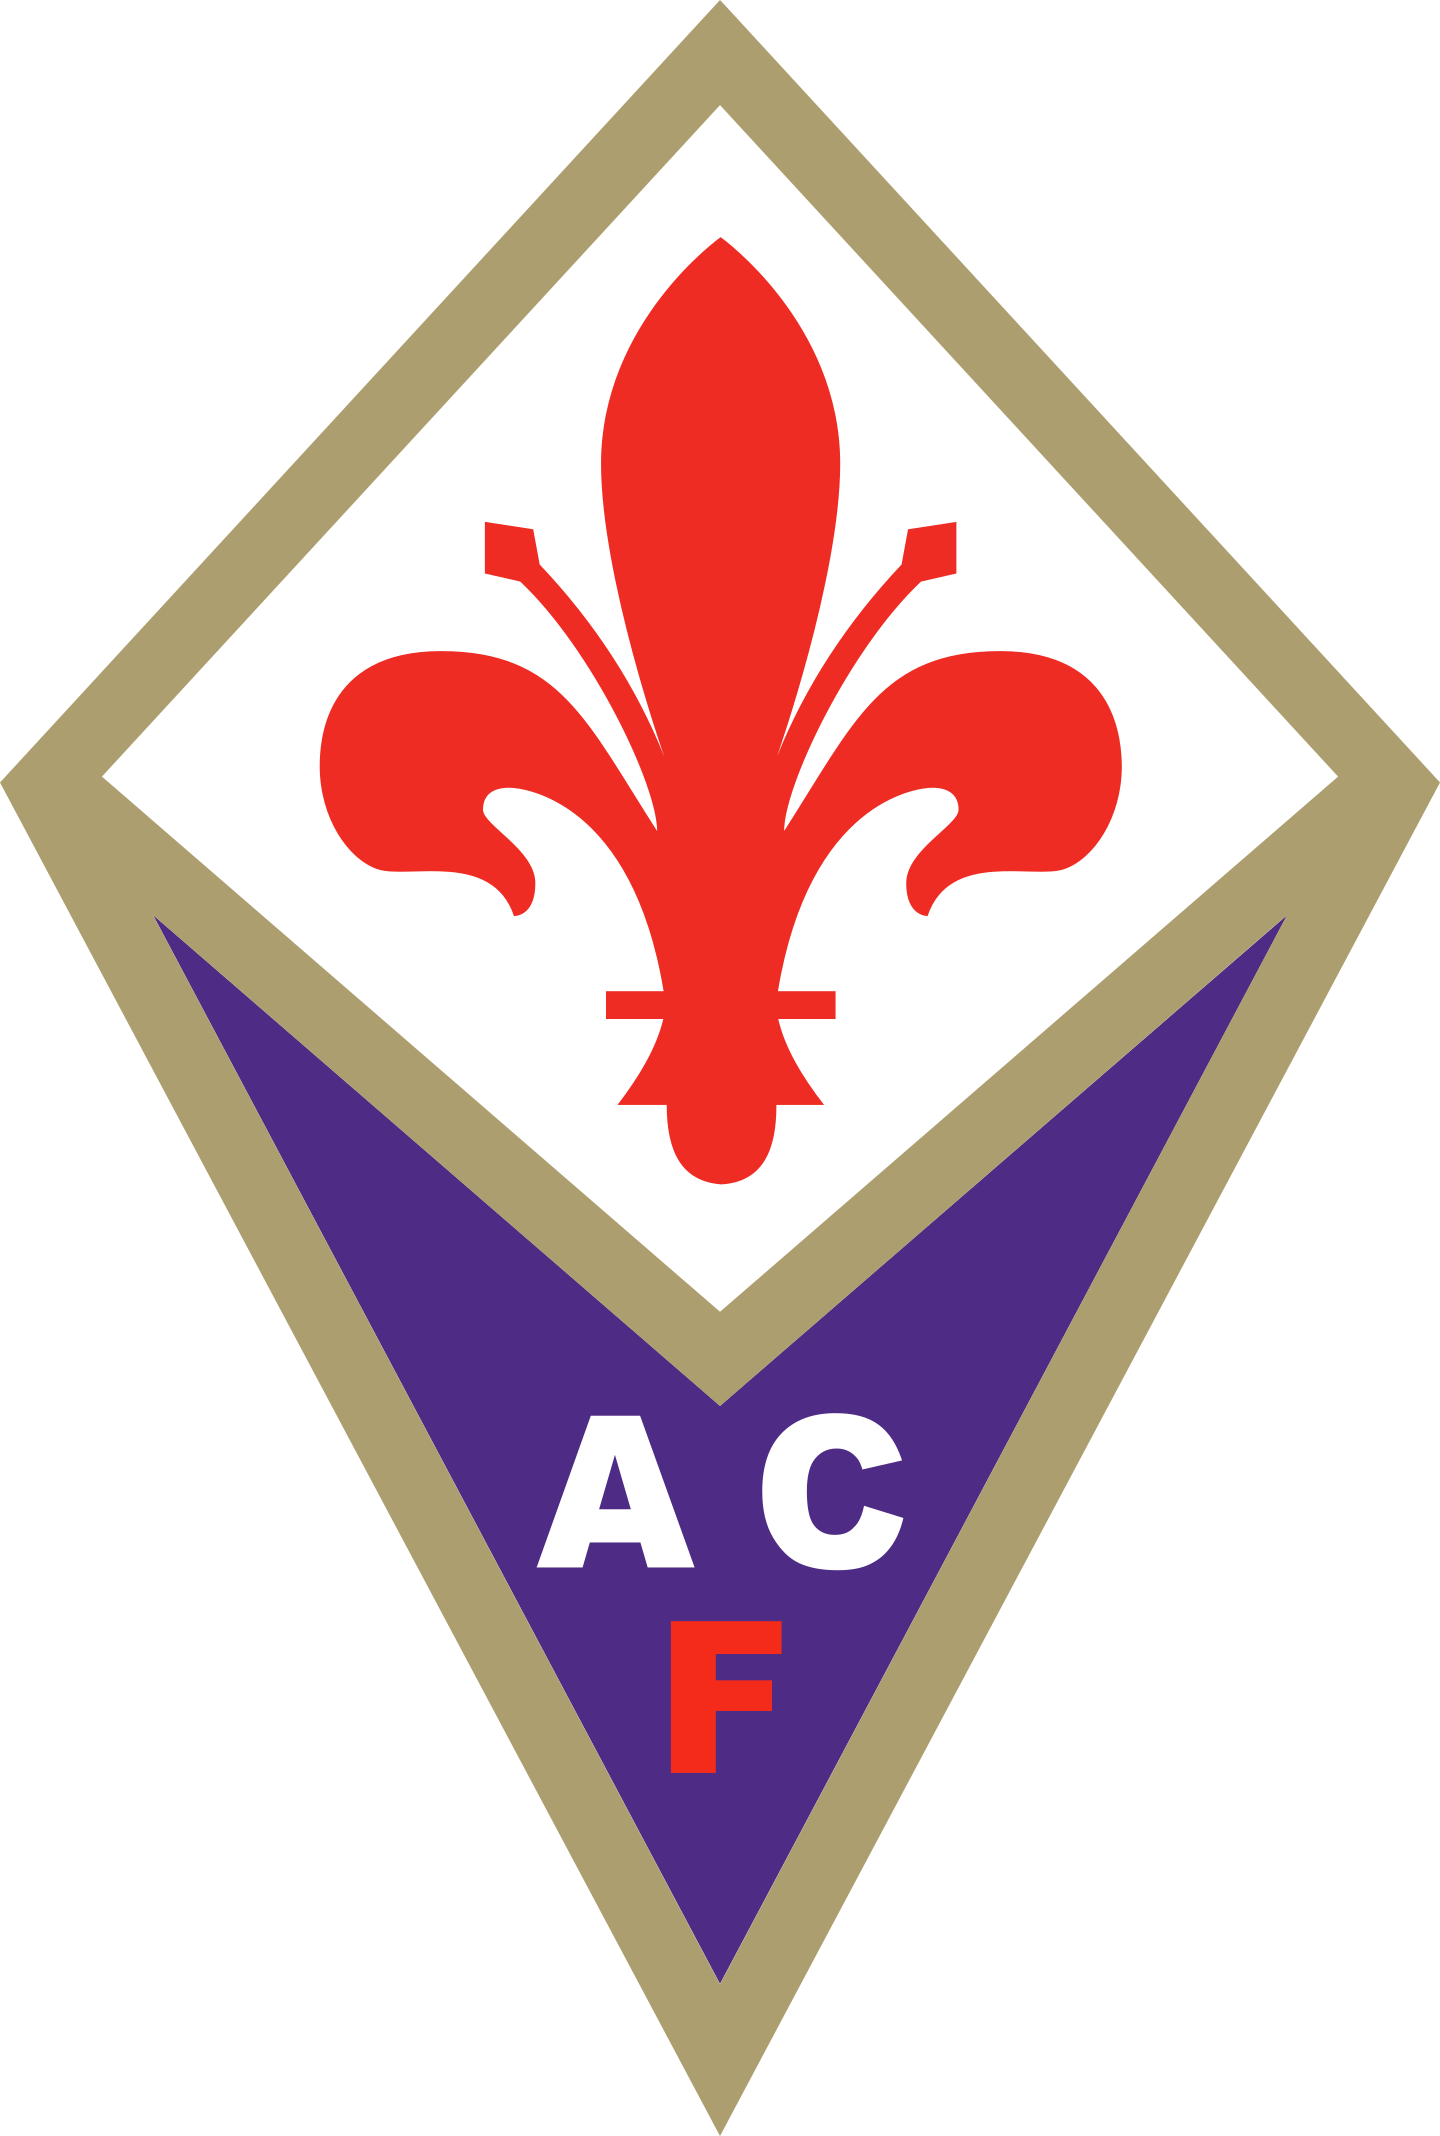 fiorentina logo 2 - ACF Fiorentina Logo